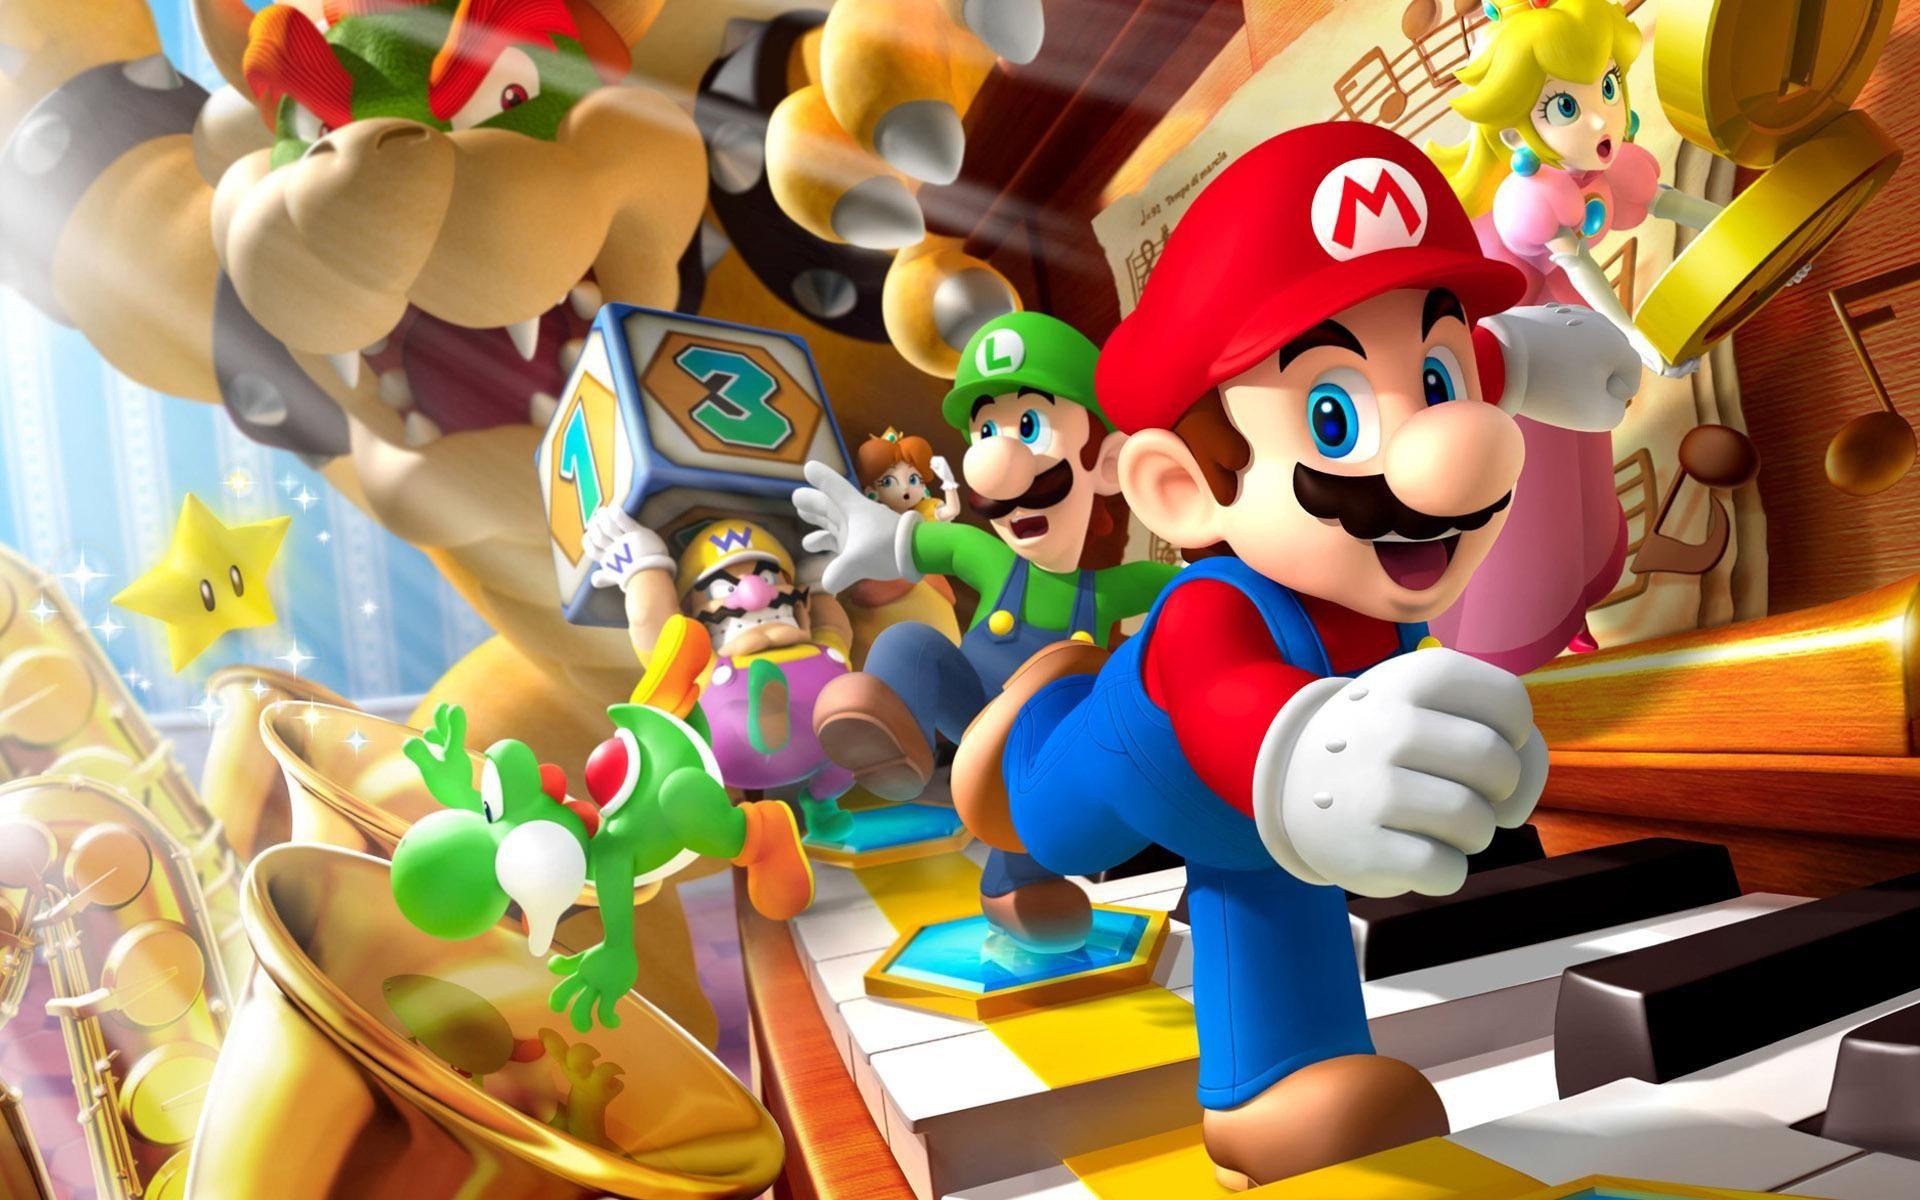 Tut i luren - idag firar vi Super Mario Day!